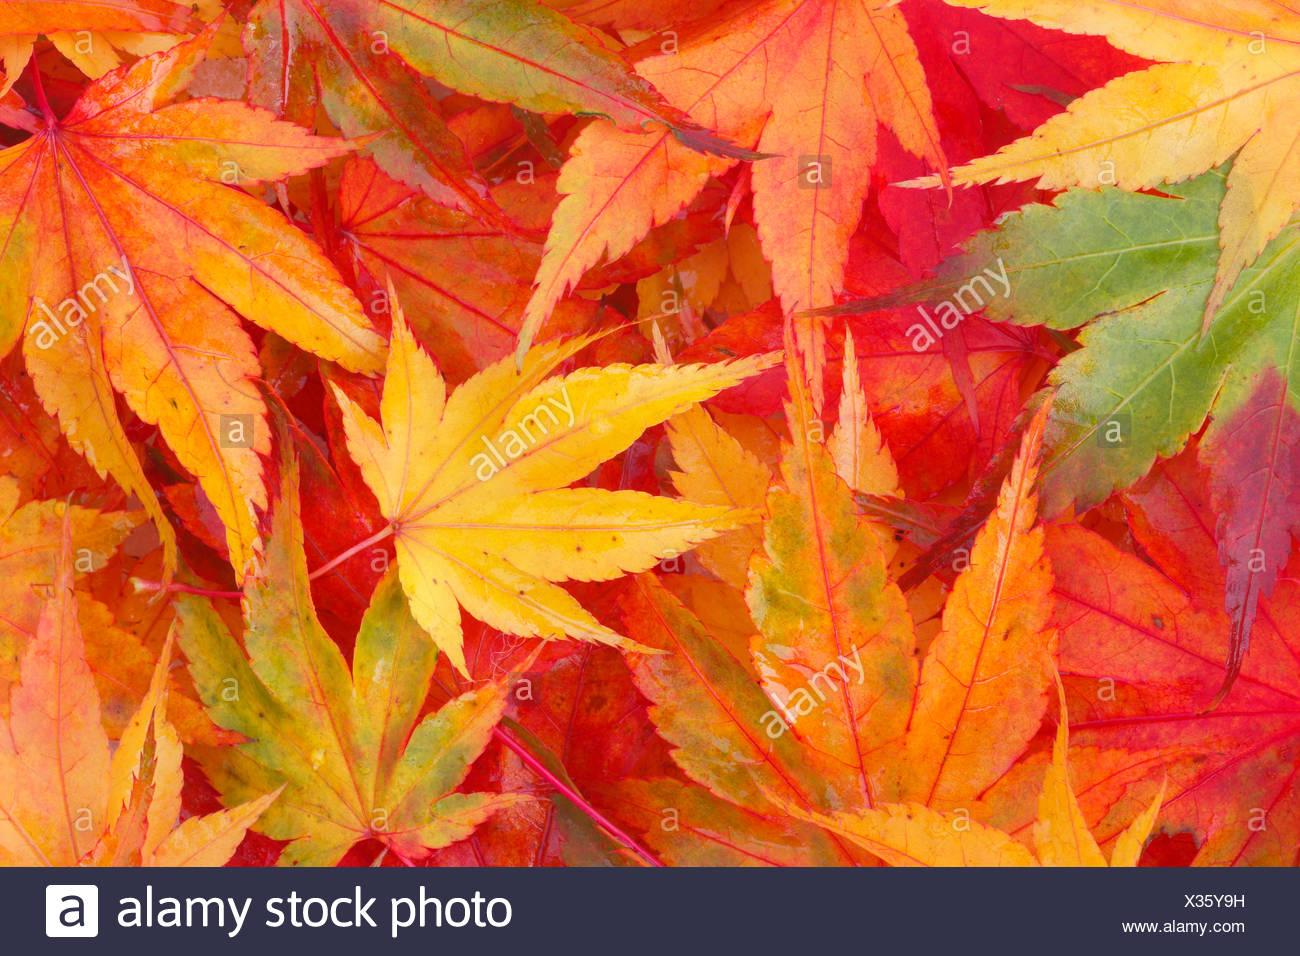 Maple Leaf Leaves Detail Autumn Colors Autumn Foliage Autumn Discoloration Foliage Macro Pattern Concepts Close Up Stock Photo Alamy